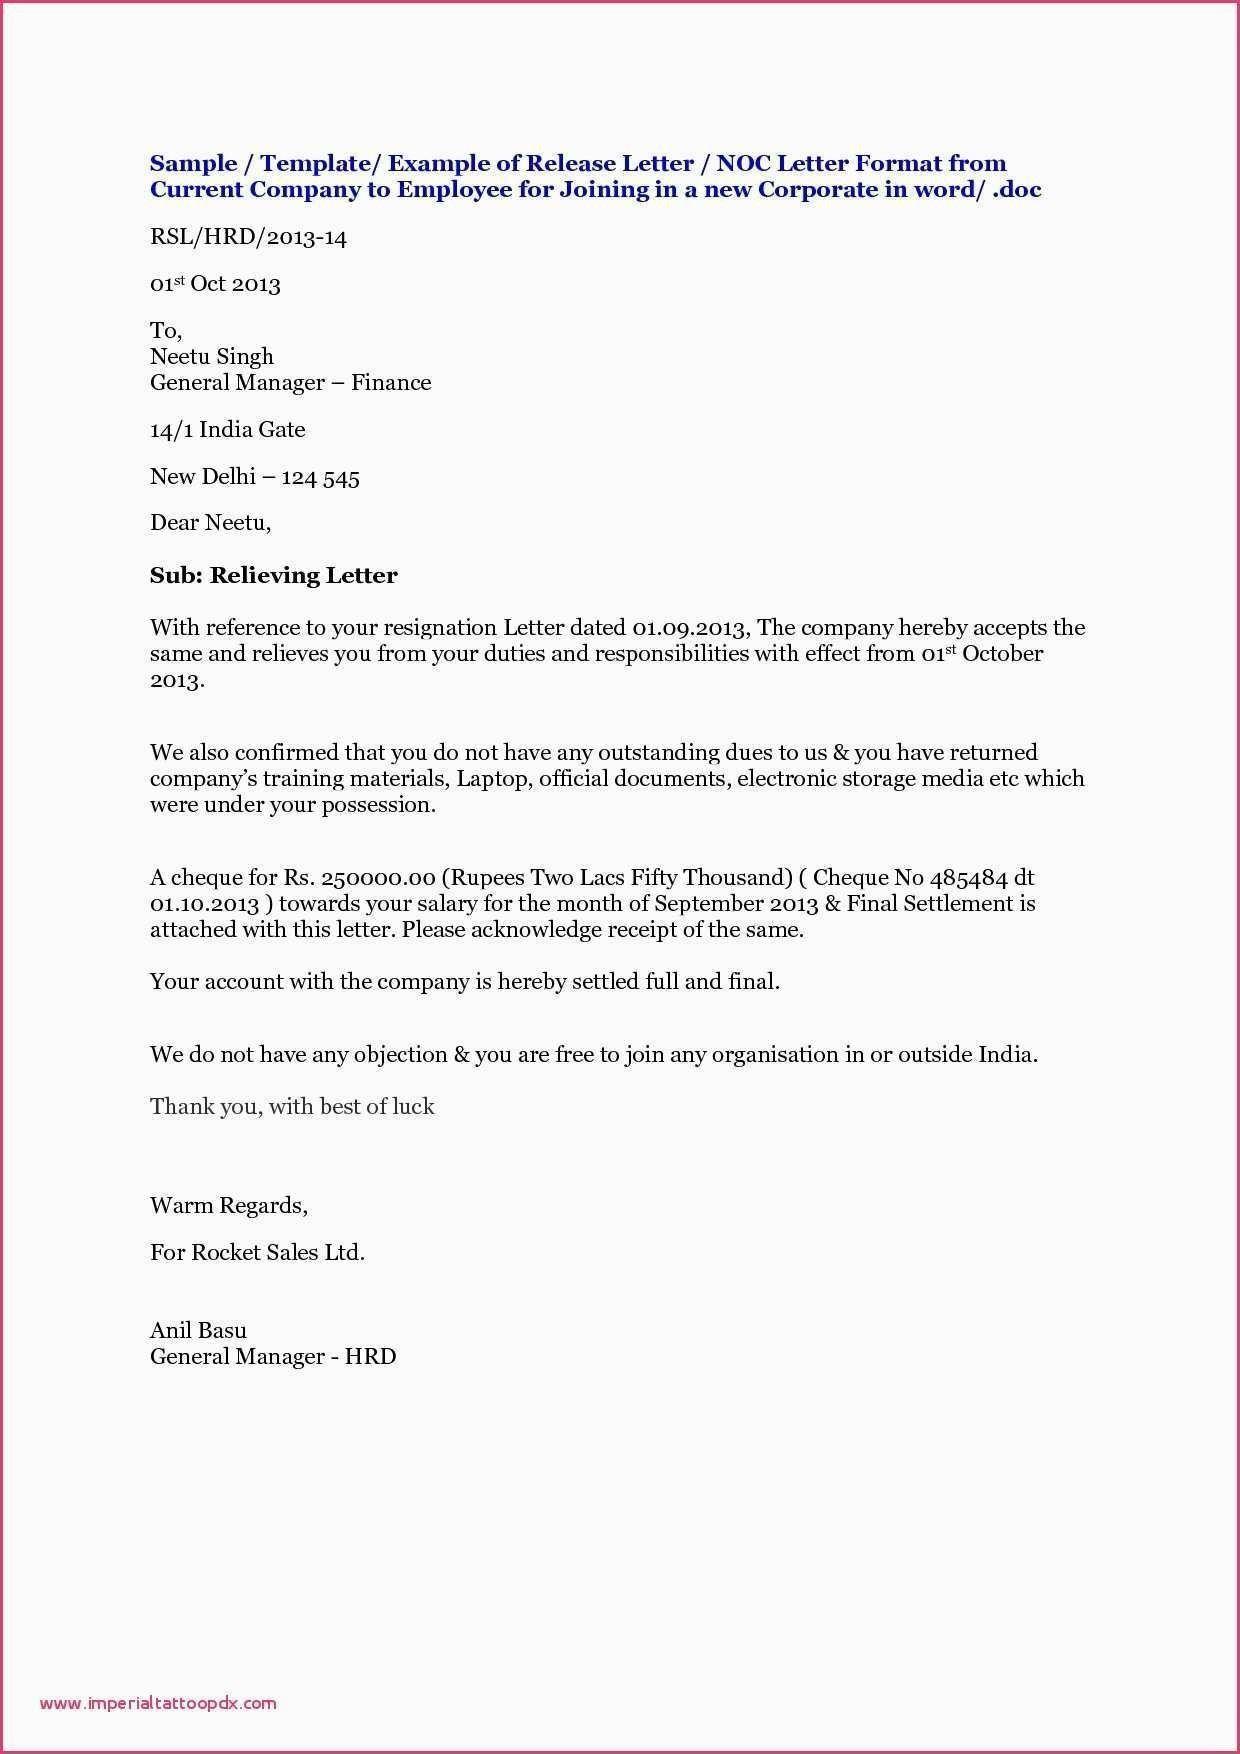 Download Fresh Noc Letter For Job Lettersample Letterformat Resumesample Resumeformat Lettering Award Template Letterhead Format